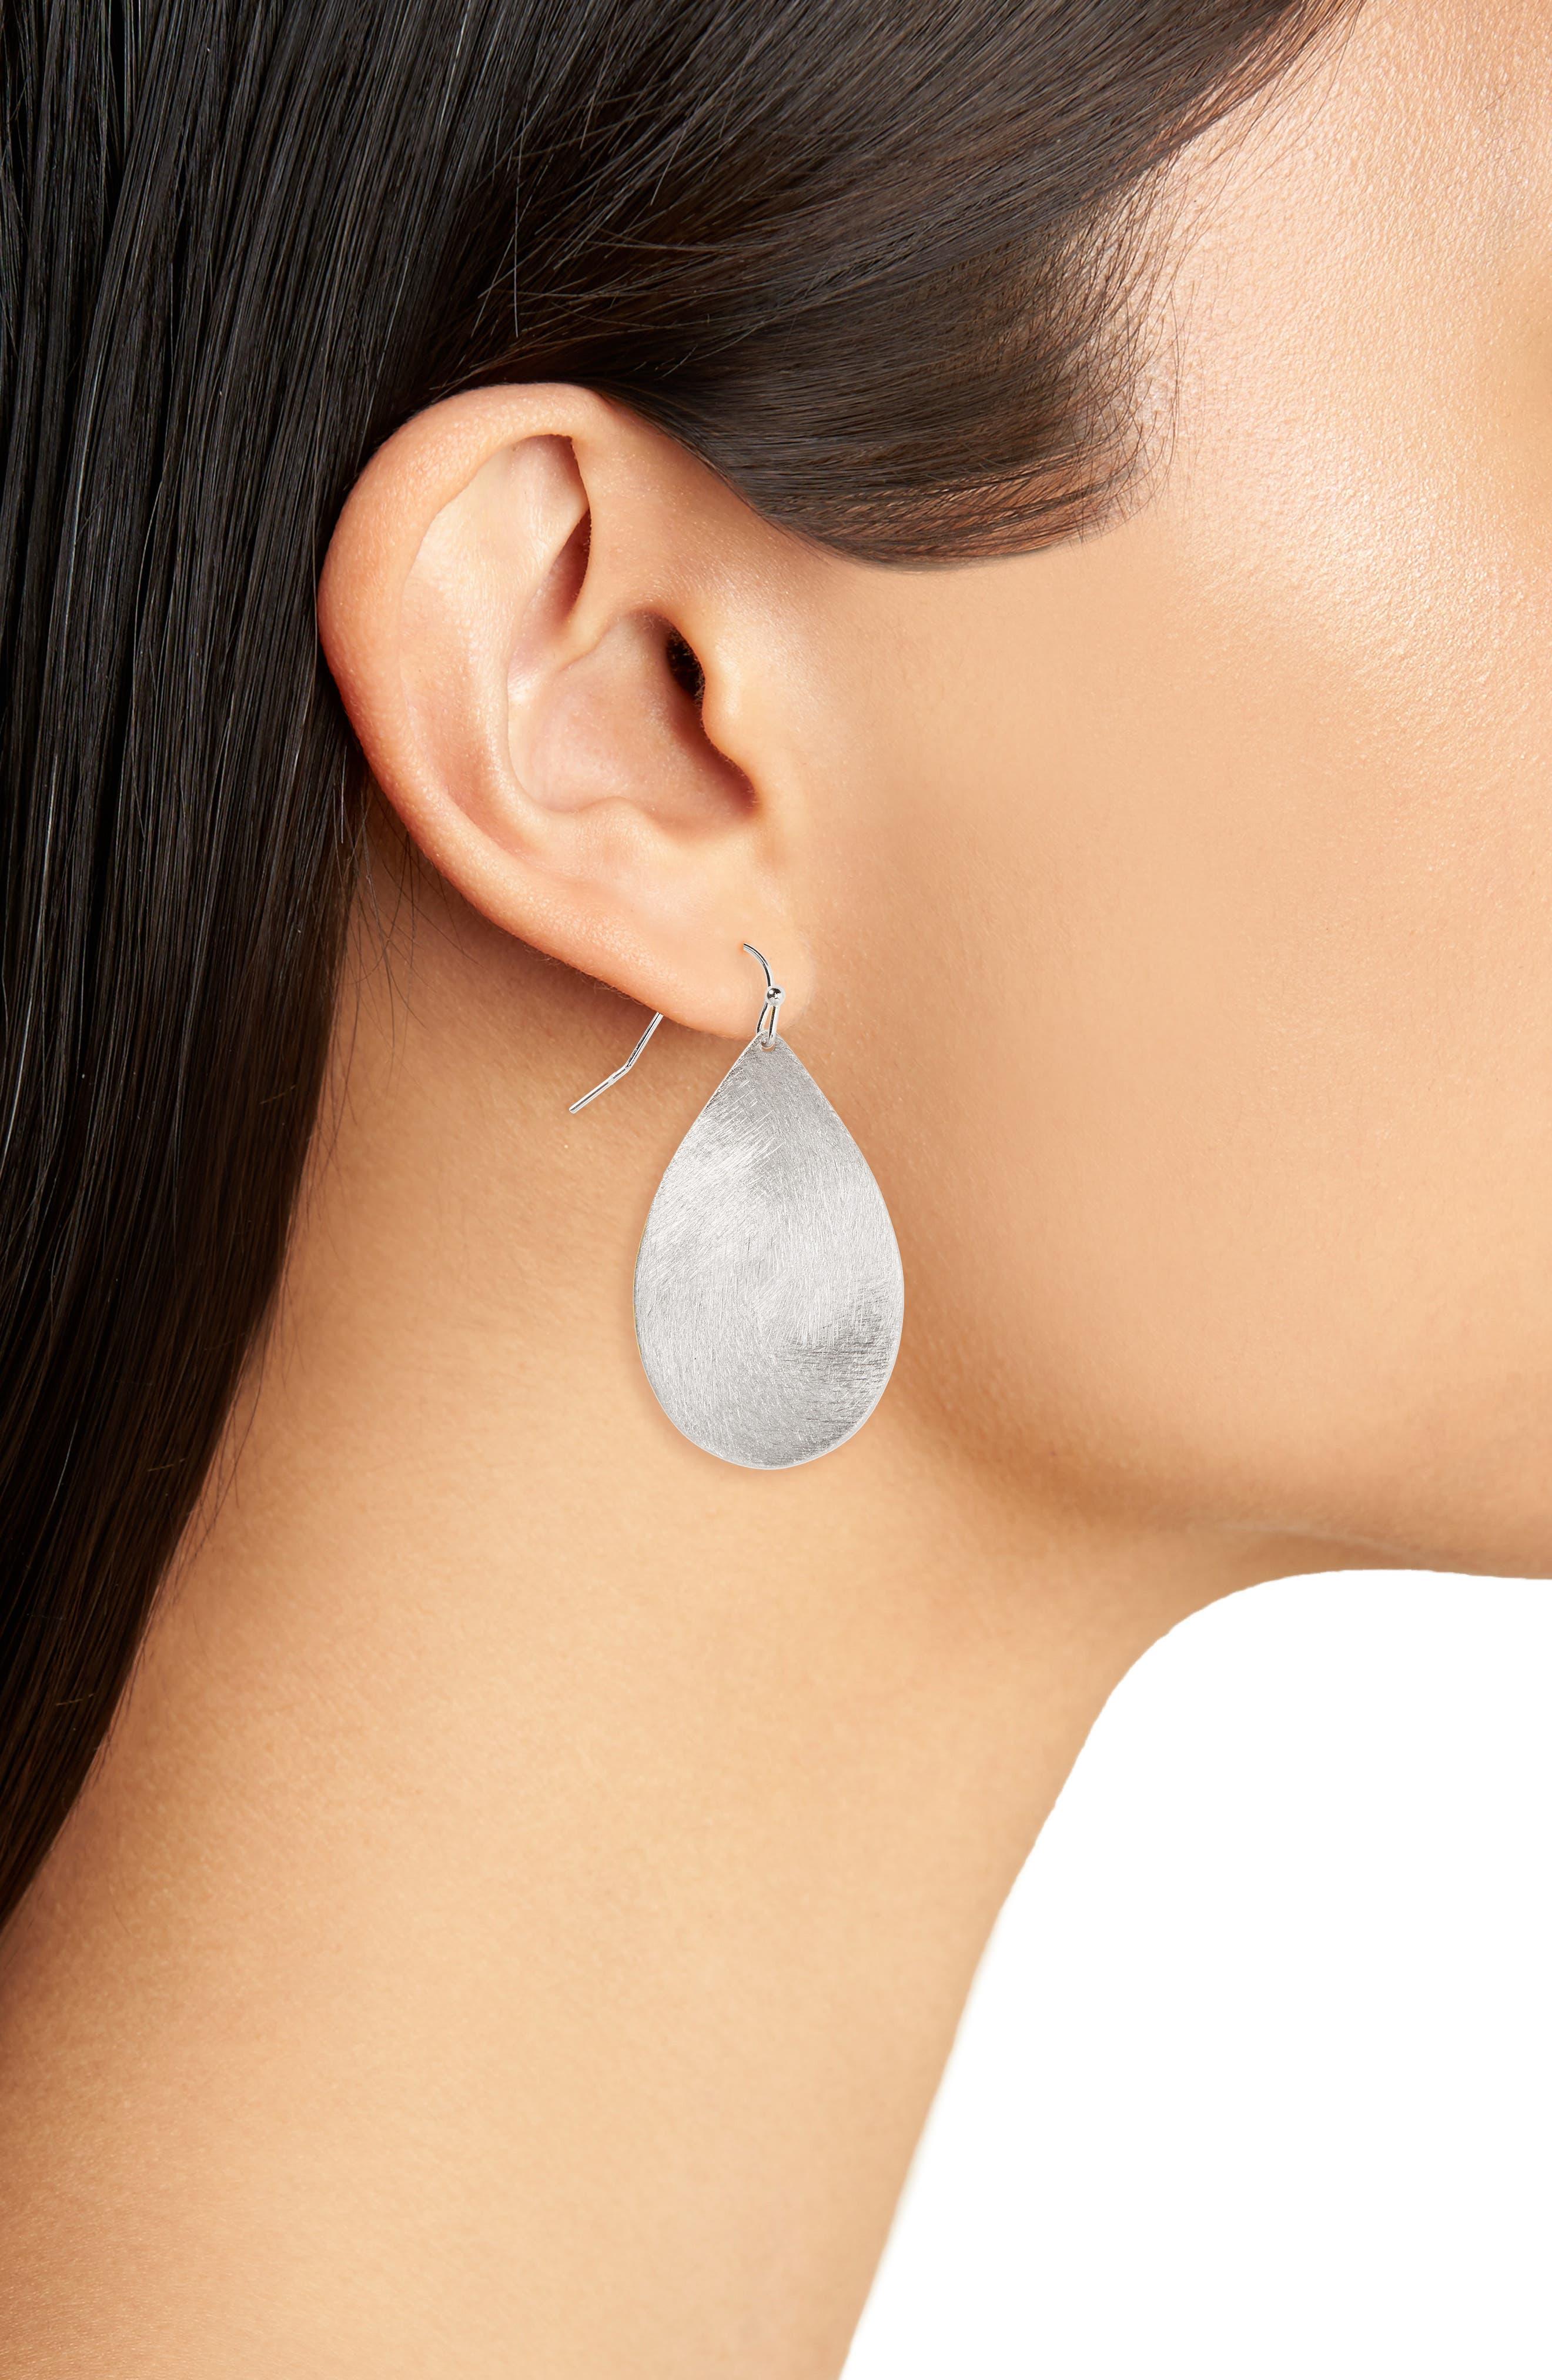 Large Brushed Teardrop Earrings,                             Alternate thumbnail 2, color,                             RHODIUM